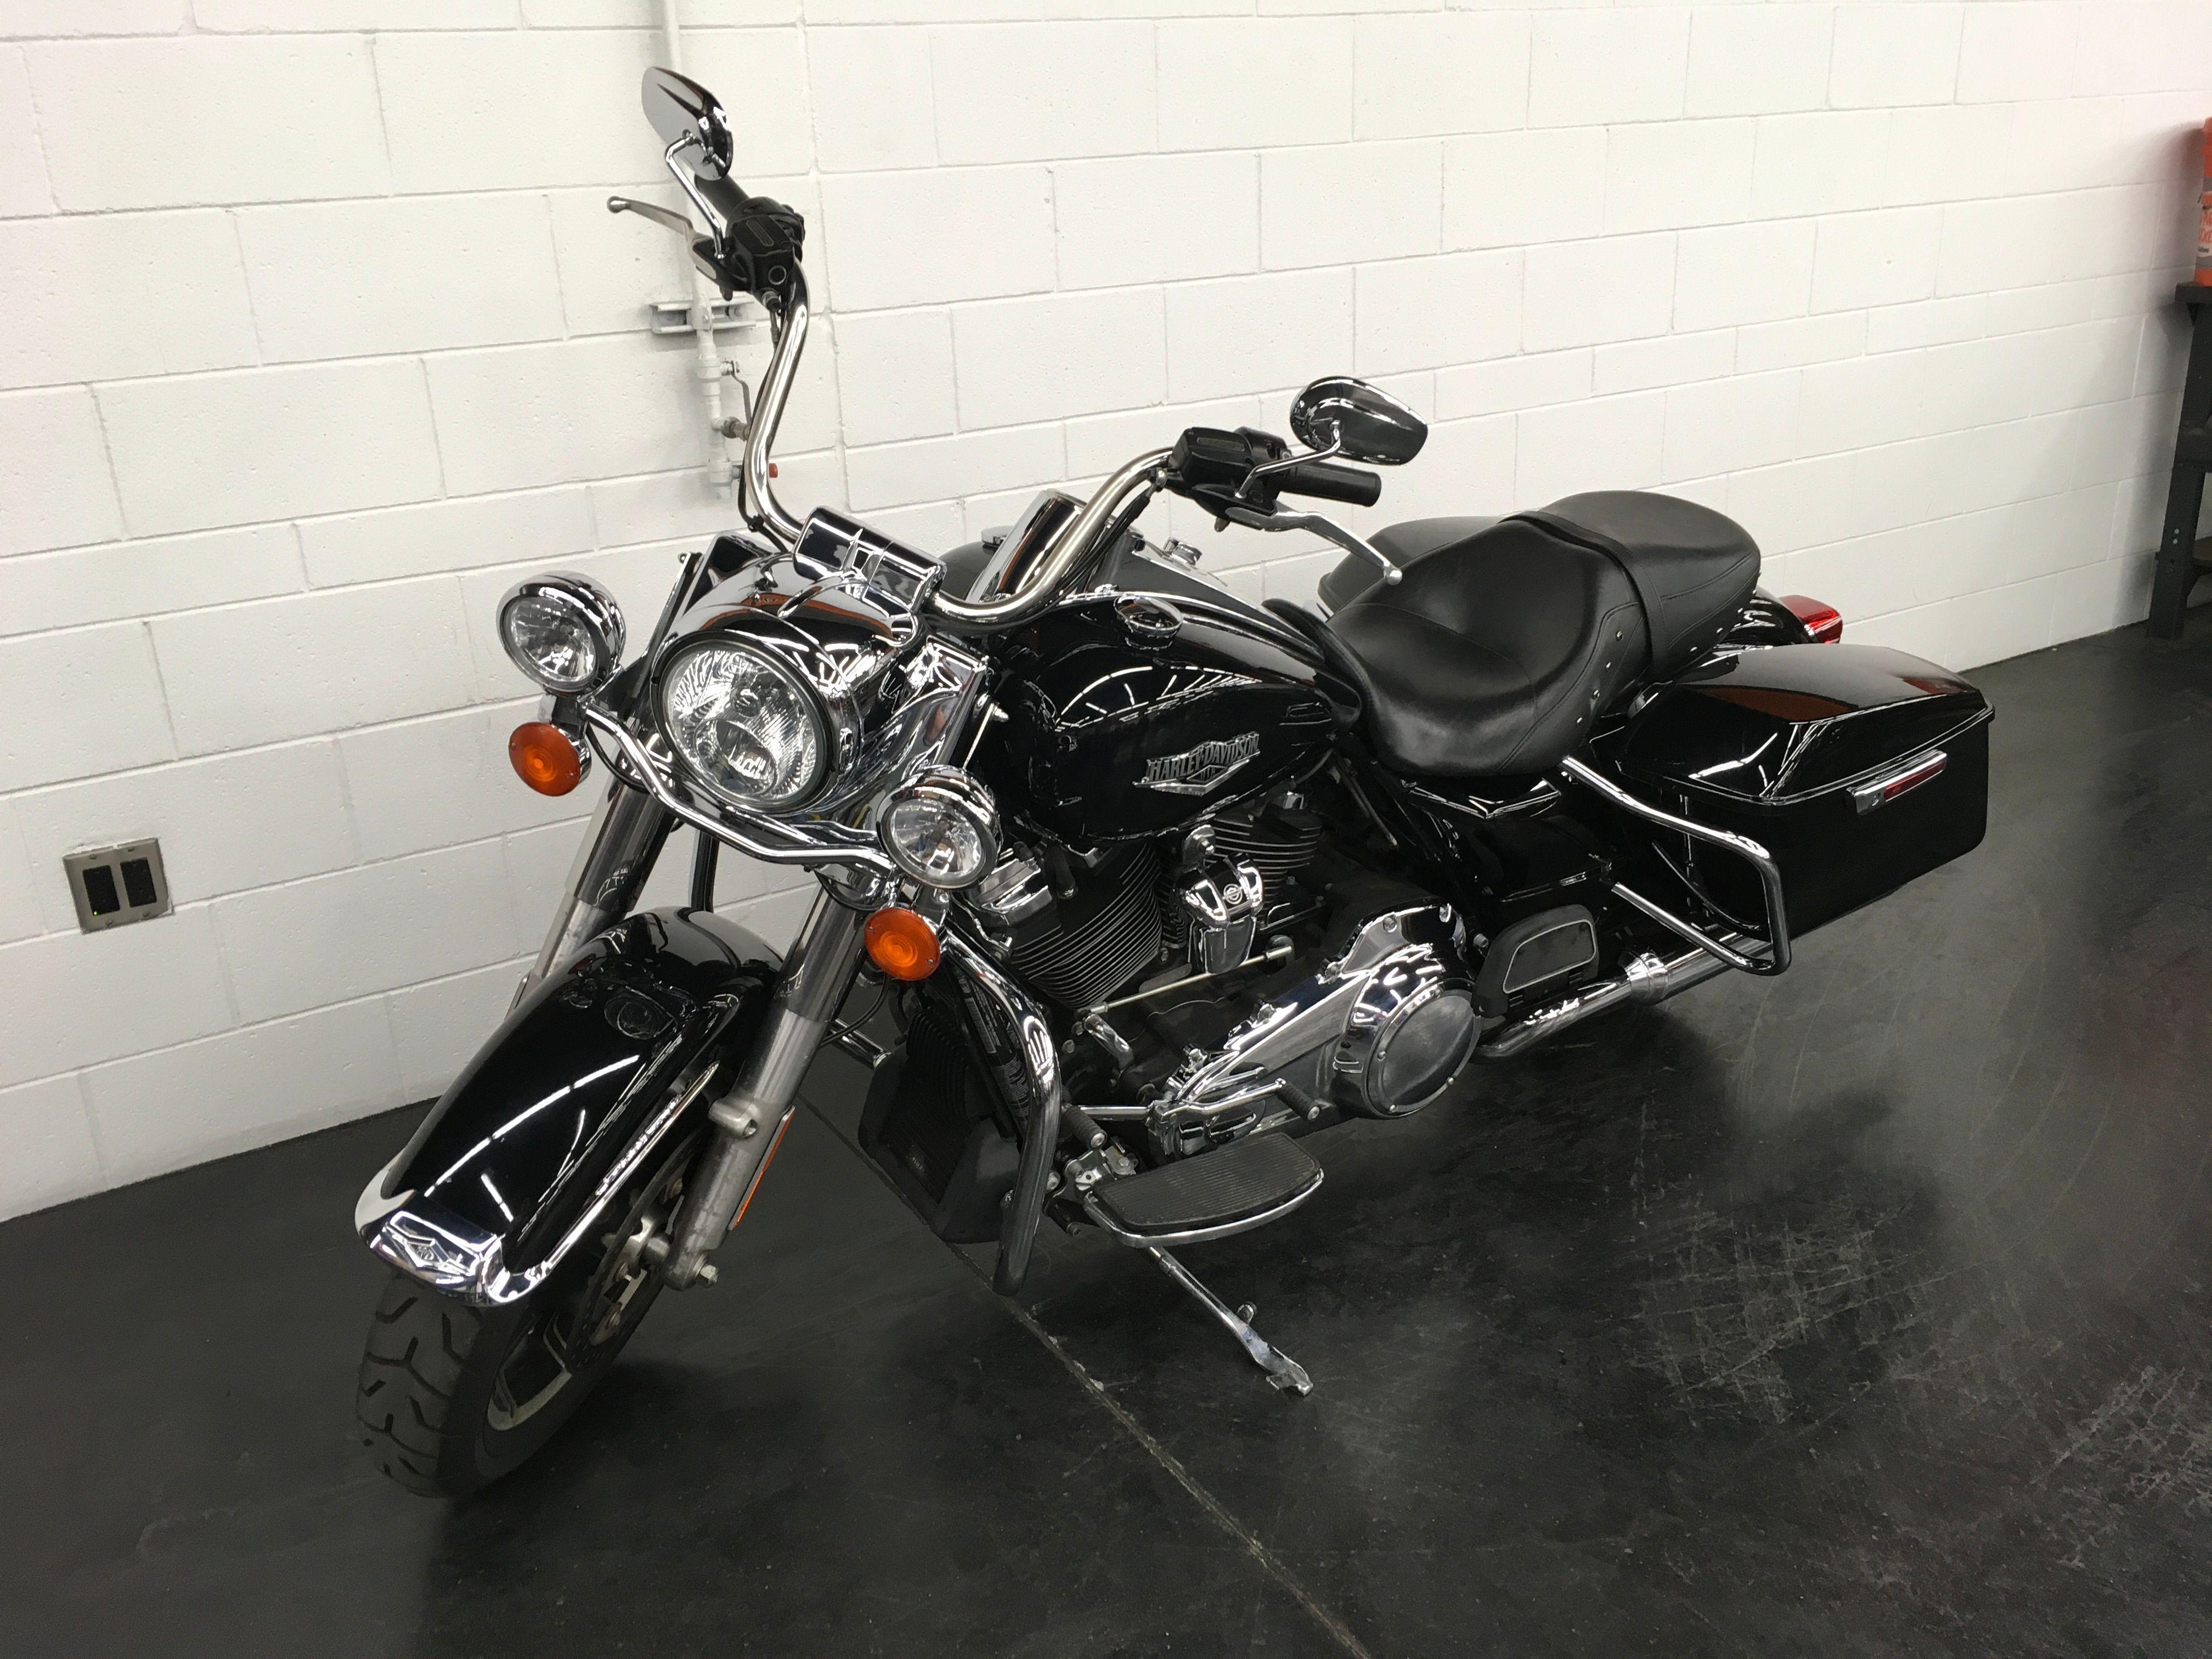 Pre-Owned 2018 Harley-Davidson Road King